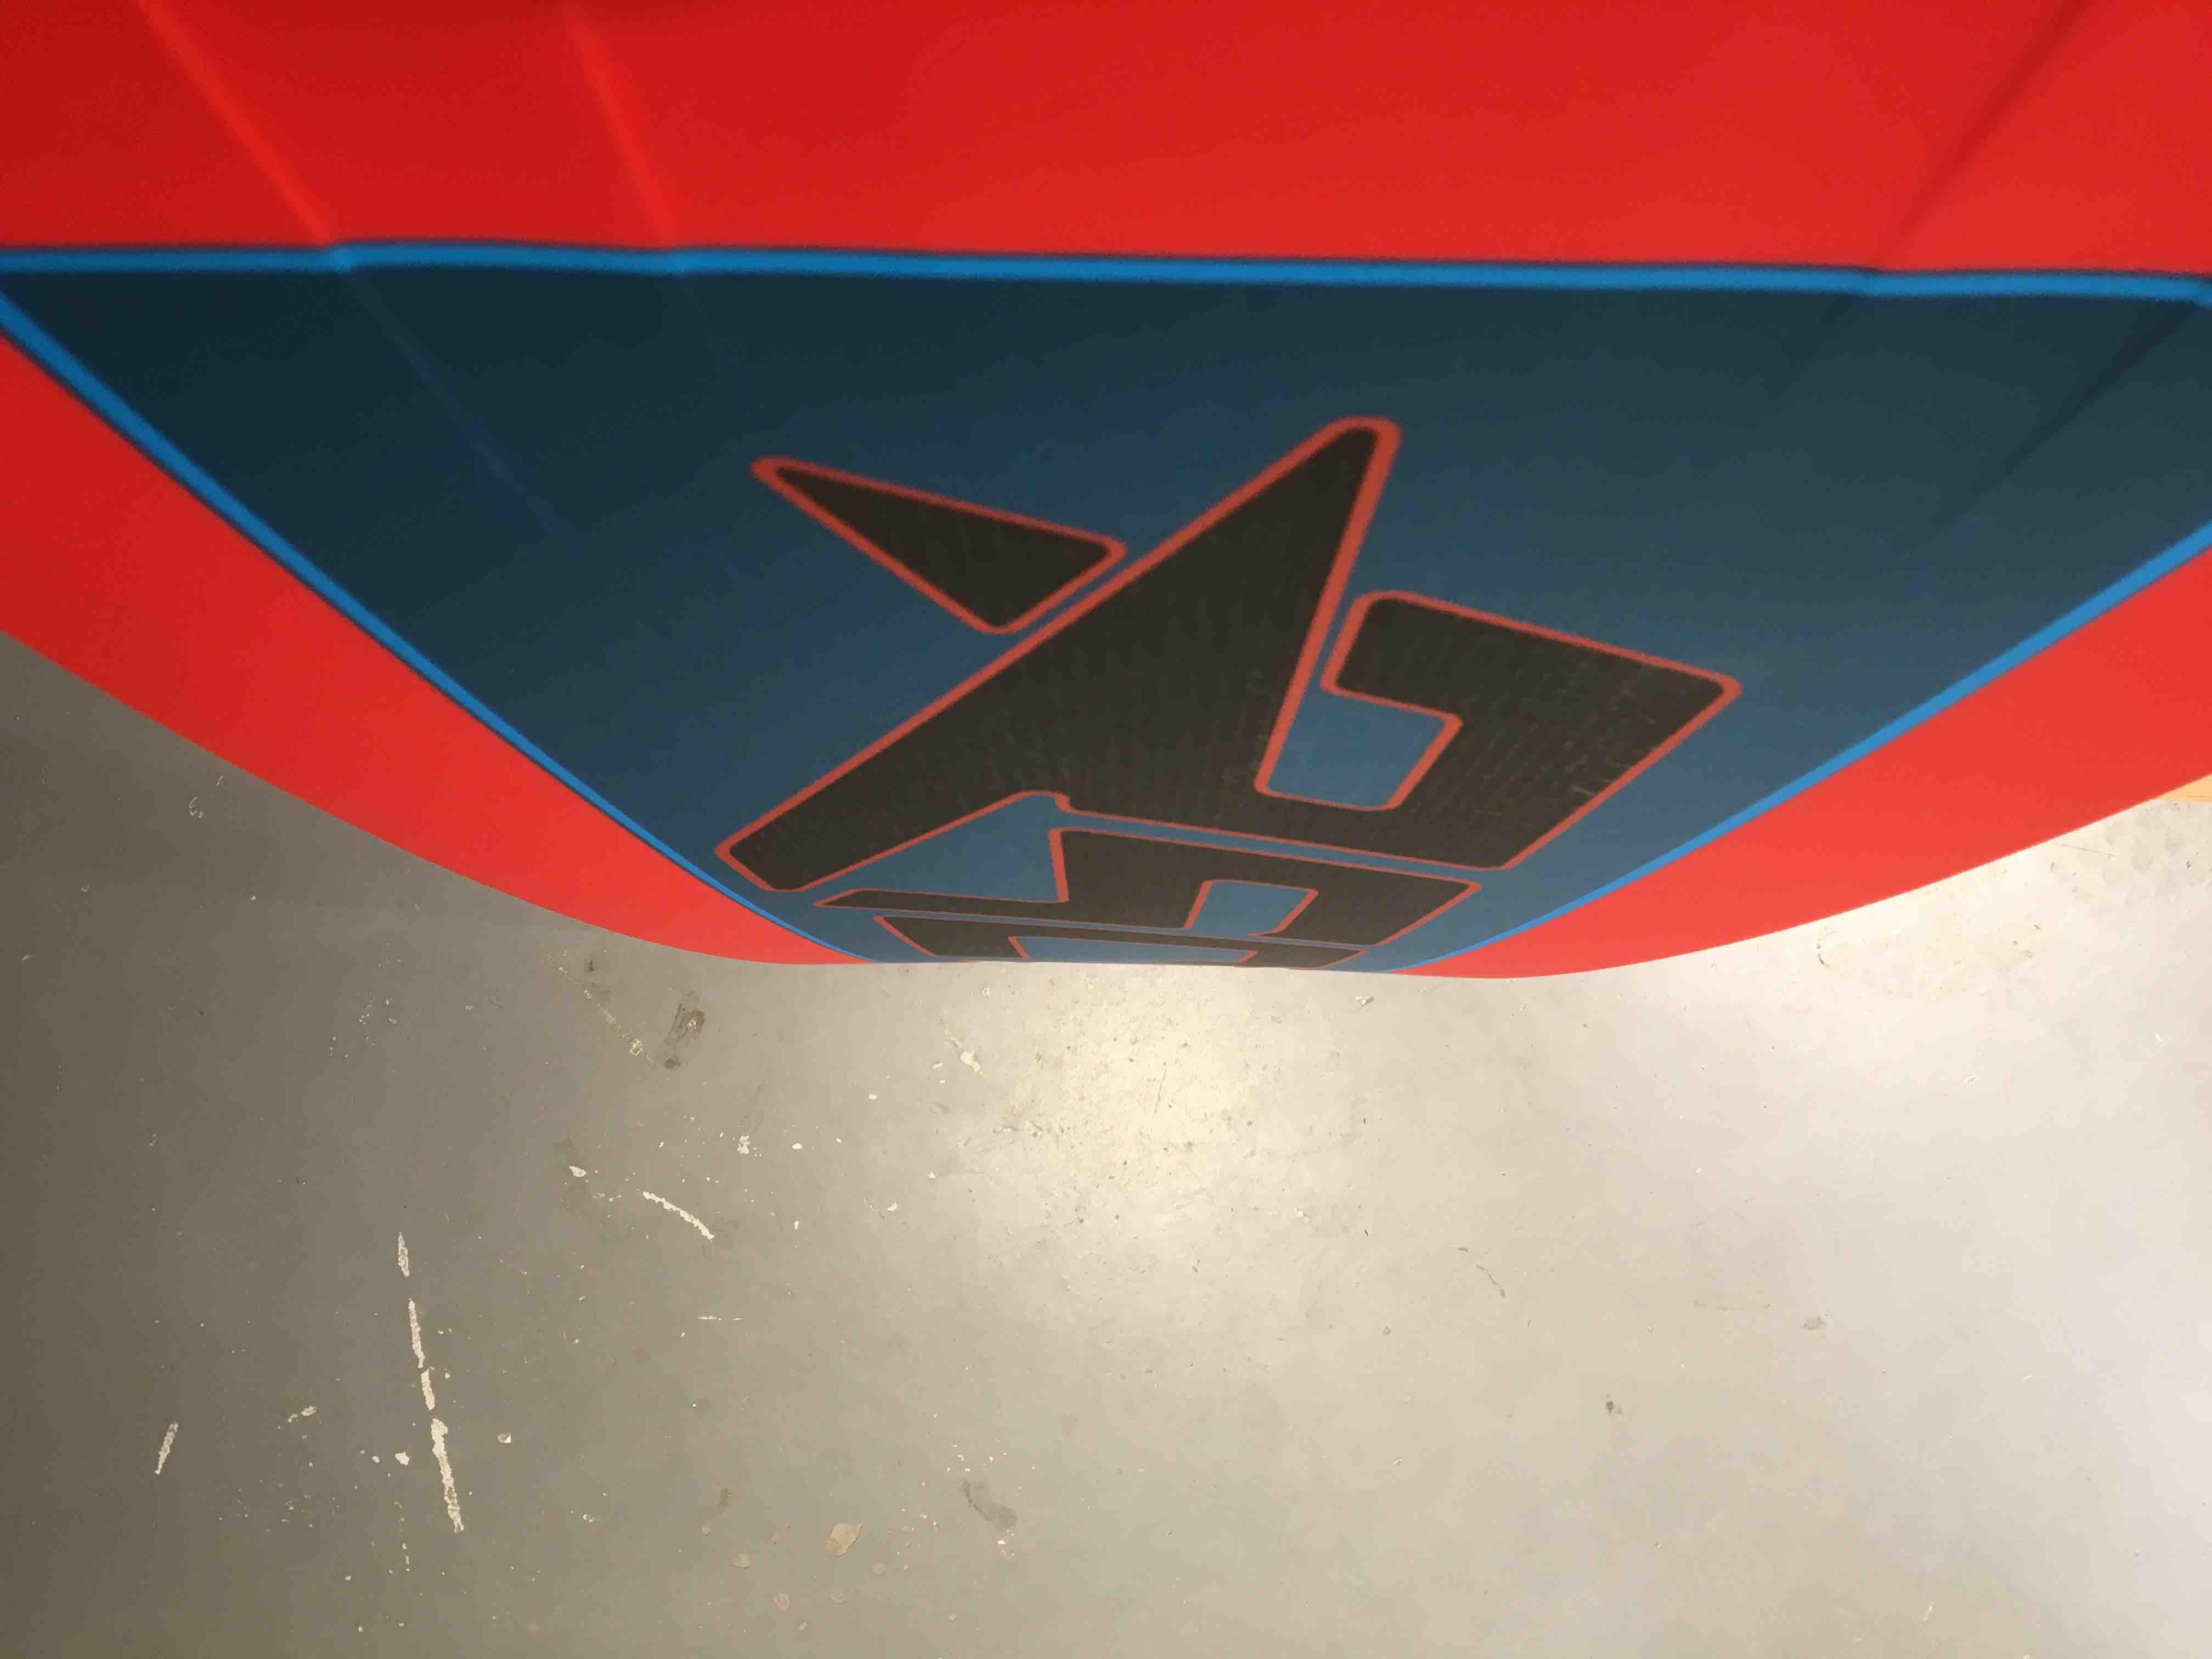 Planche Twin-Tip Kitesurf RSC Supreme Pro 2018 The Corner Shop_5